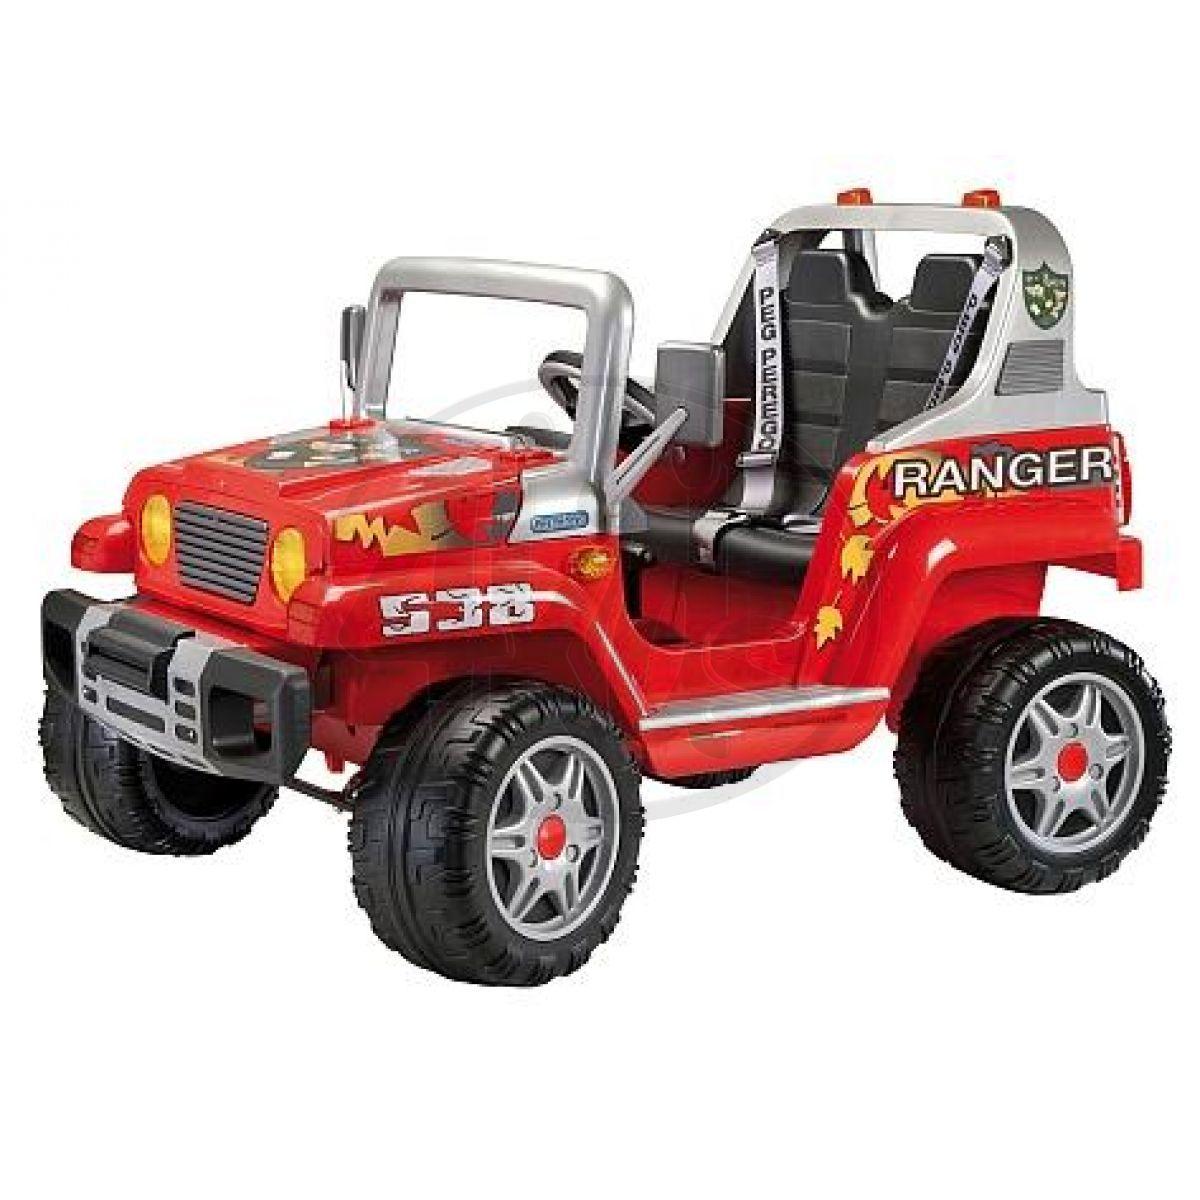 Детские электромобили peg-perego и toys toys, продажа ...